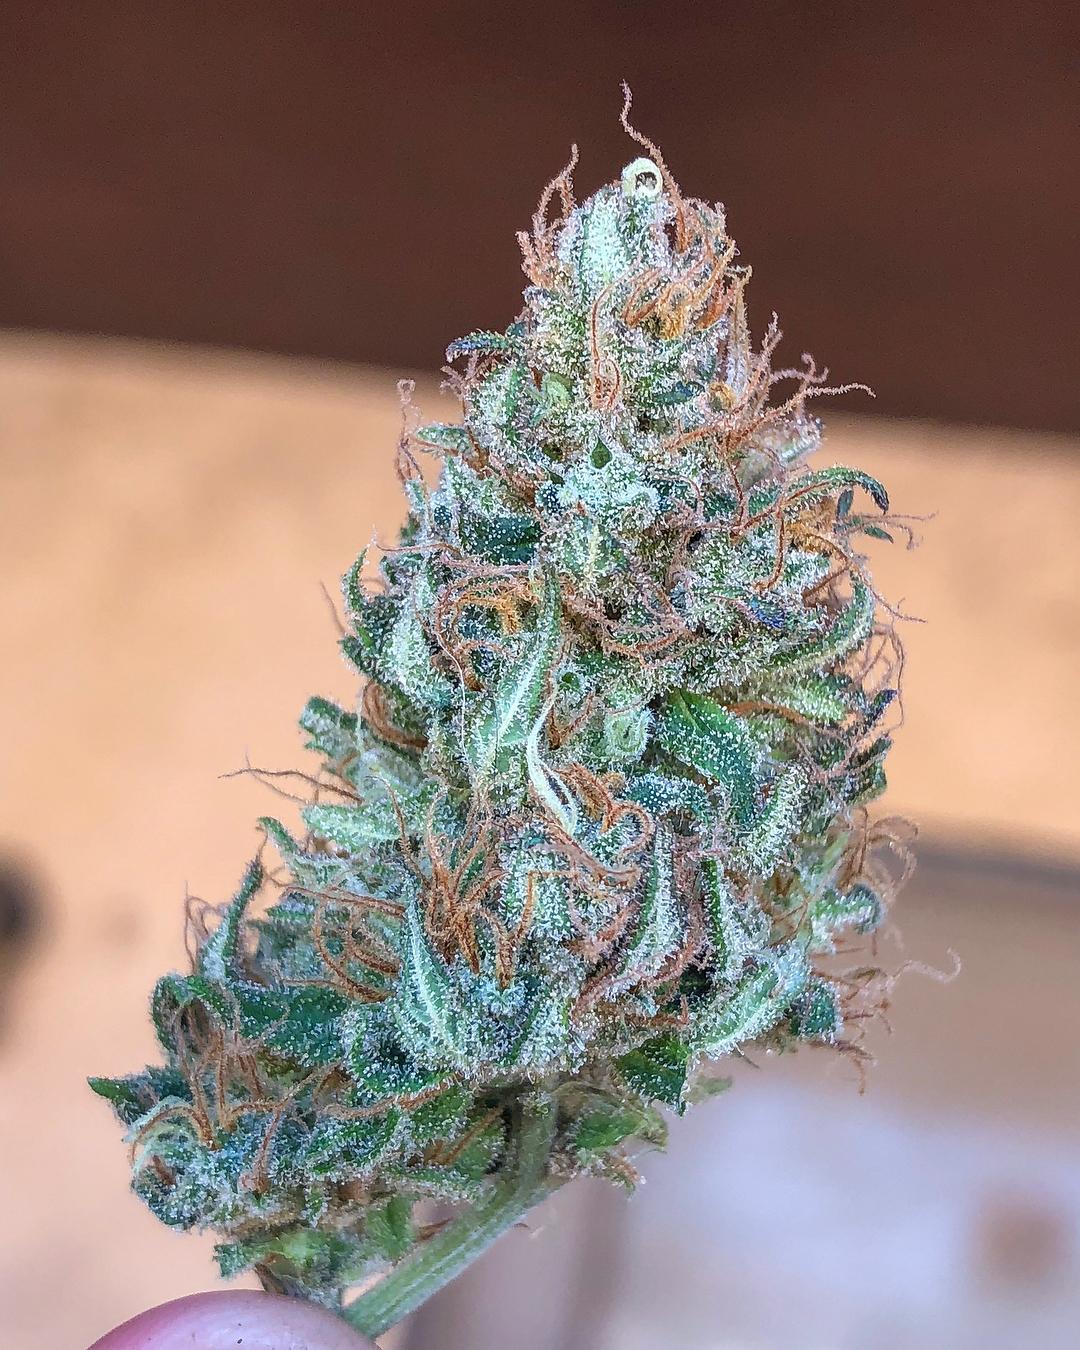 Papaya cannabis